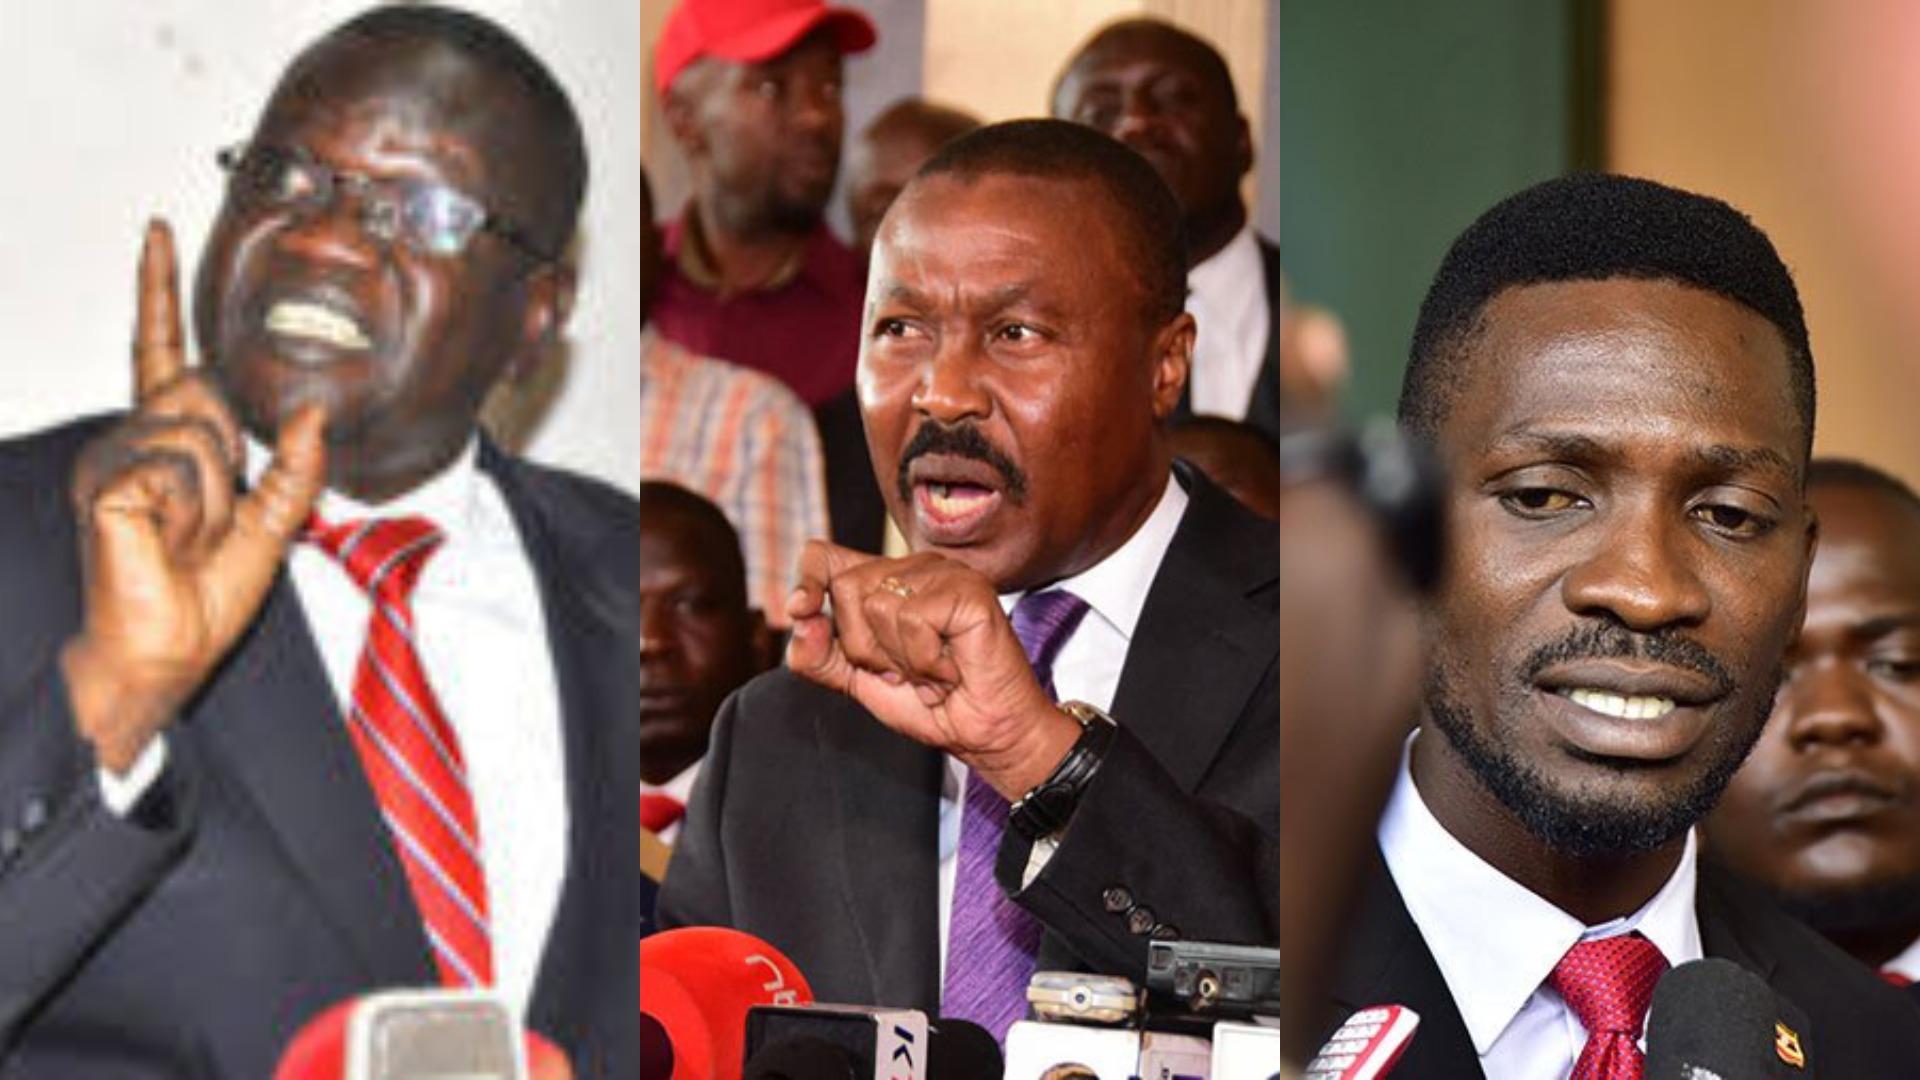 The year 2018 presented a political powershift revolving around Kyadondo East MP Robert Kyagulanyi alias Bobi Wine's People Power, Patrick Amuriat Oboi's FDC Party and Mugisha Muntu's New Formation (FILE PHOTO)